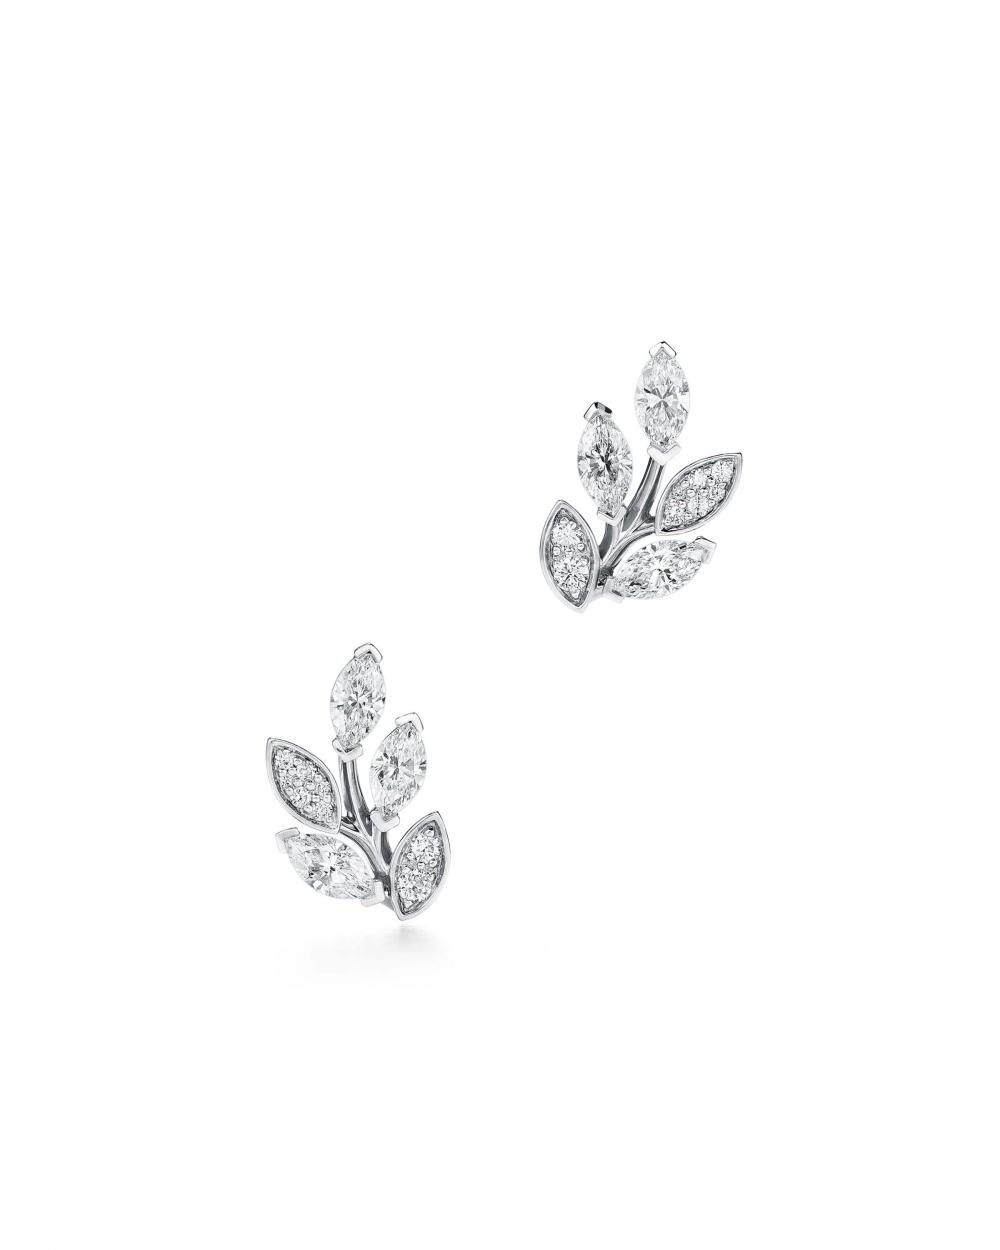 4. Tiffany Victoria® diamond vine climber earrings in platinum with diamonds_HKD 93,000